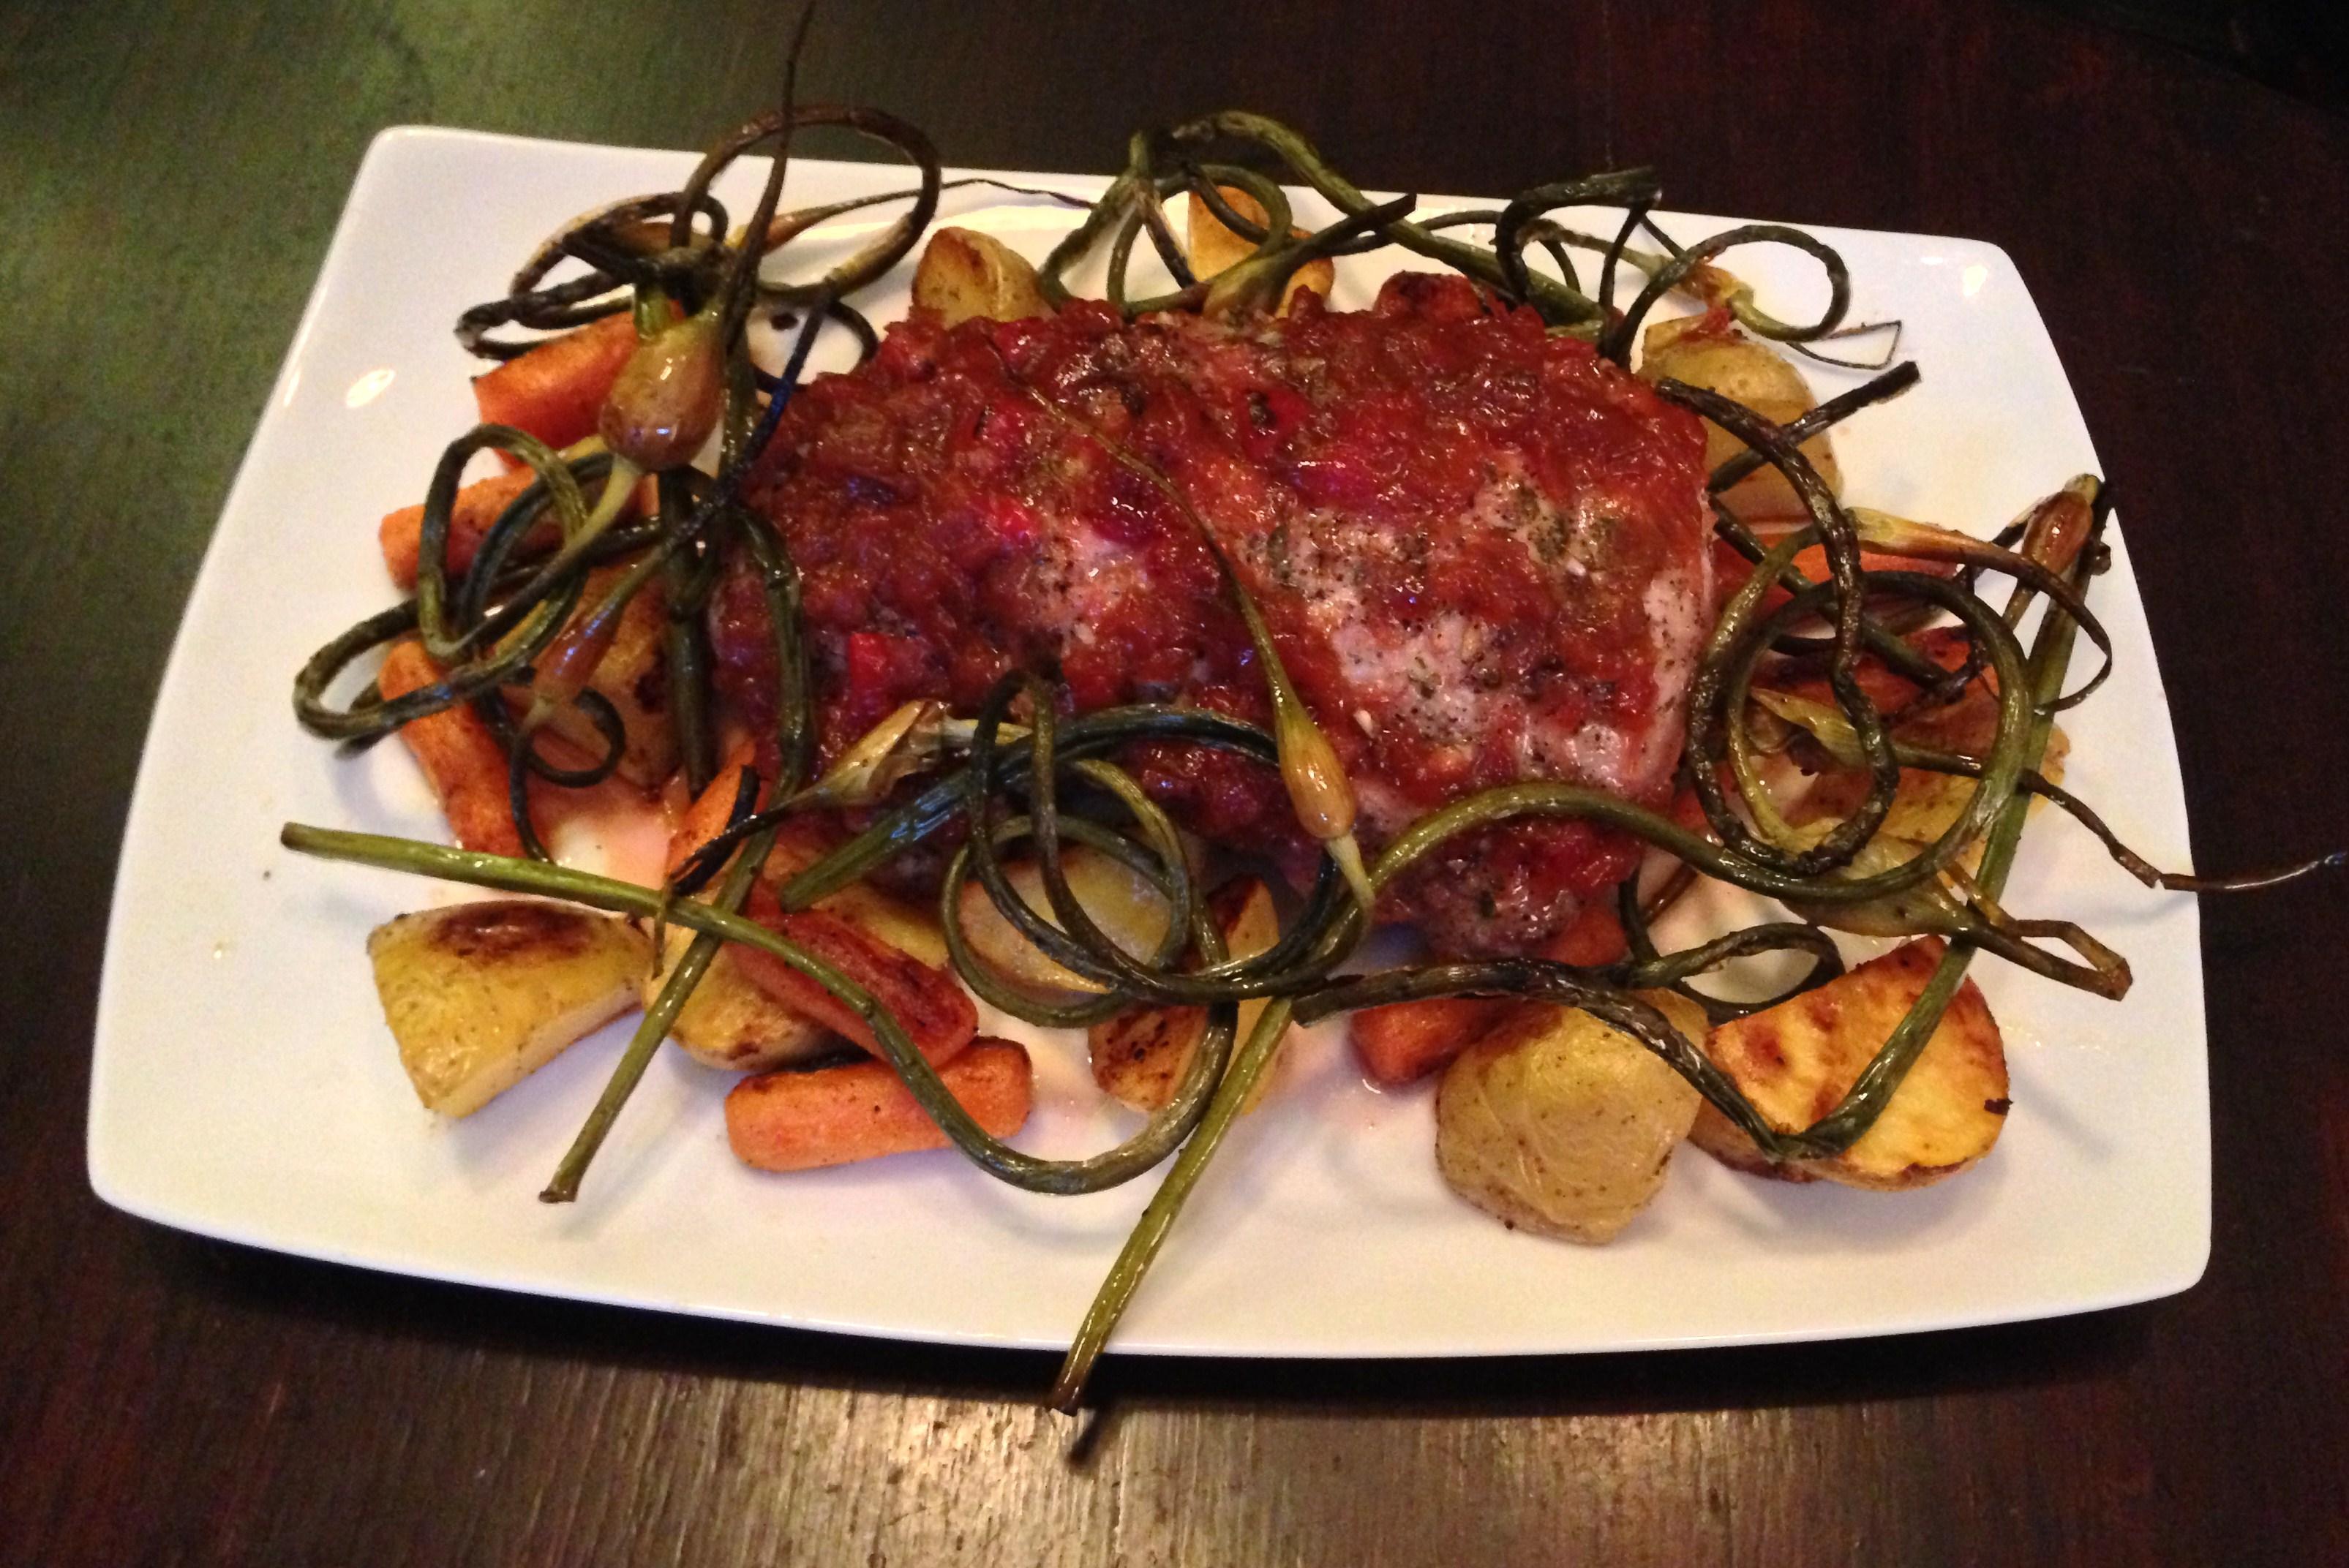 Roast Pork with Strawberry Rhubarb Compote